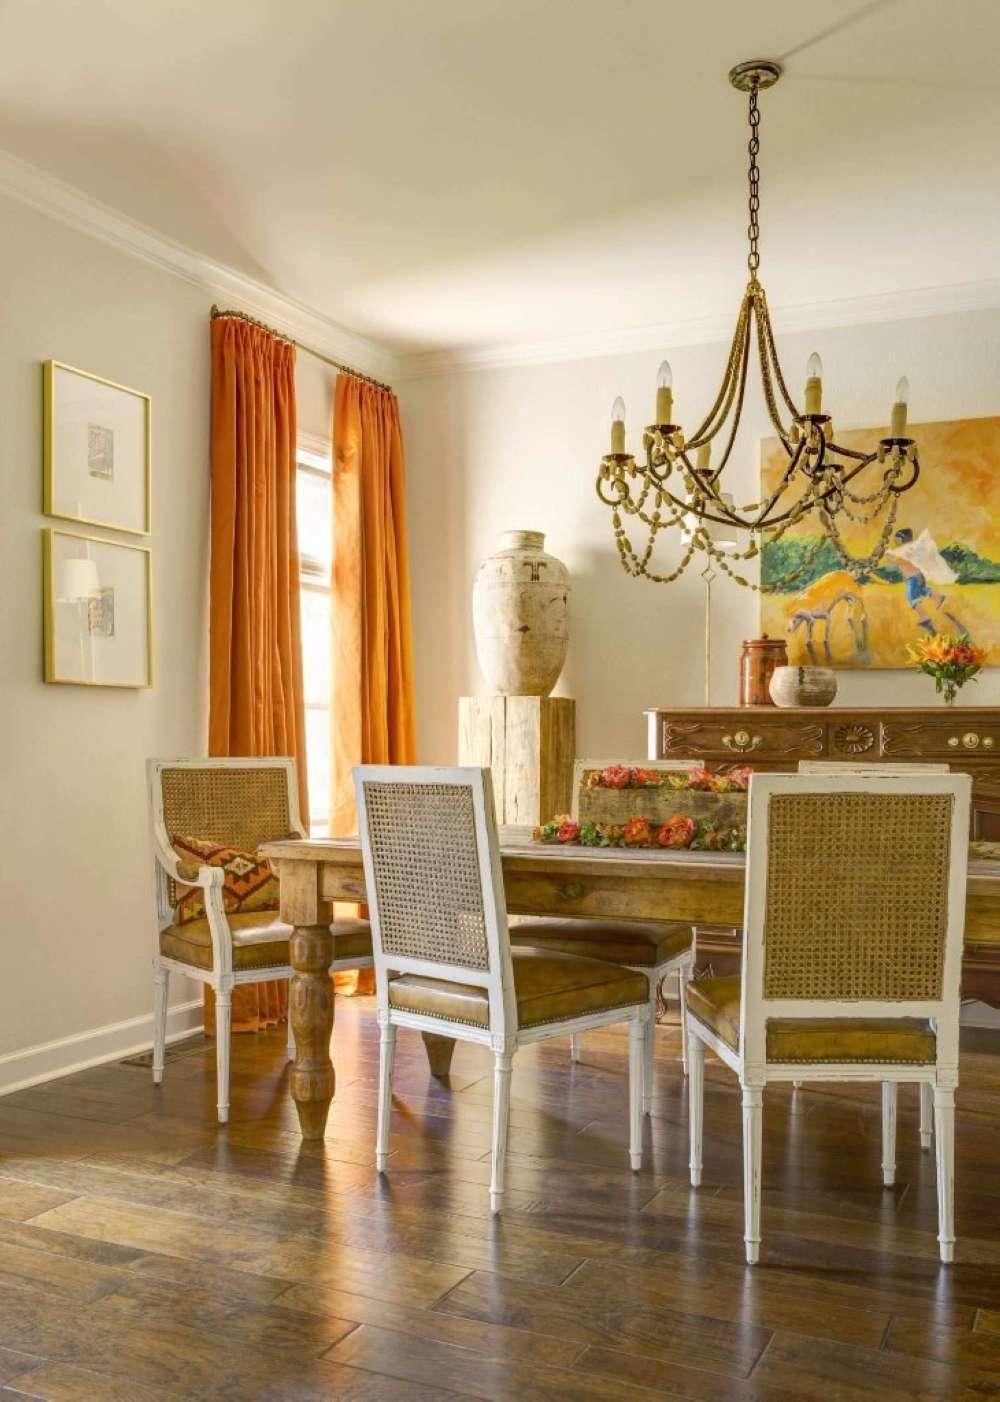 Arkansas-interior-design-Southern-Comfort-k-lewis-interior-design-IMG_004